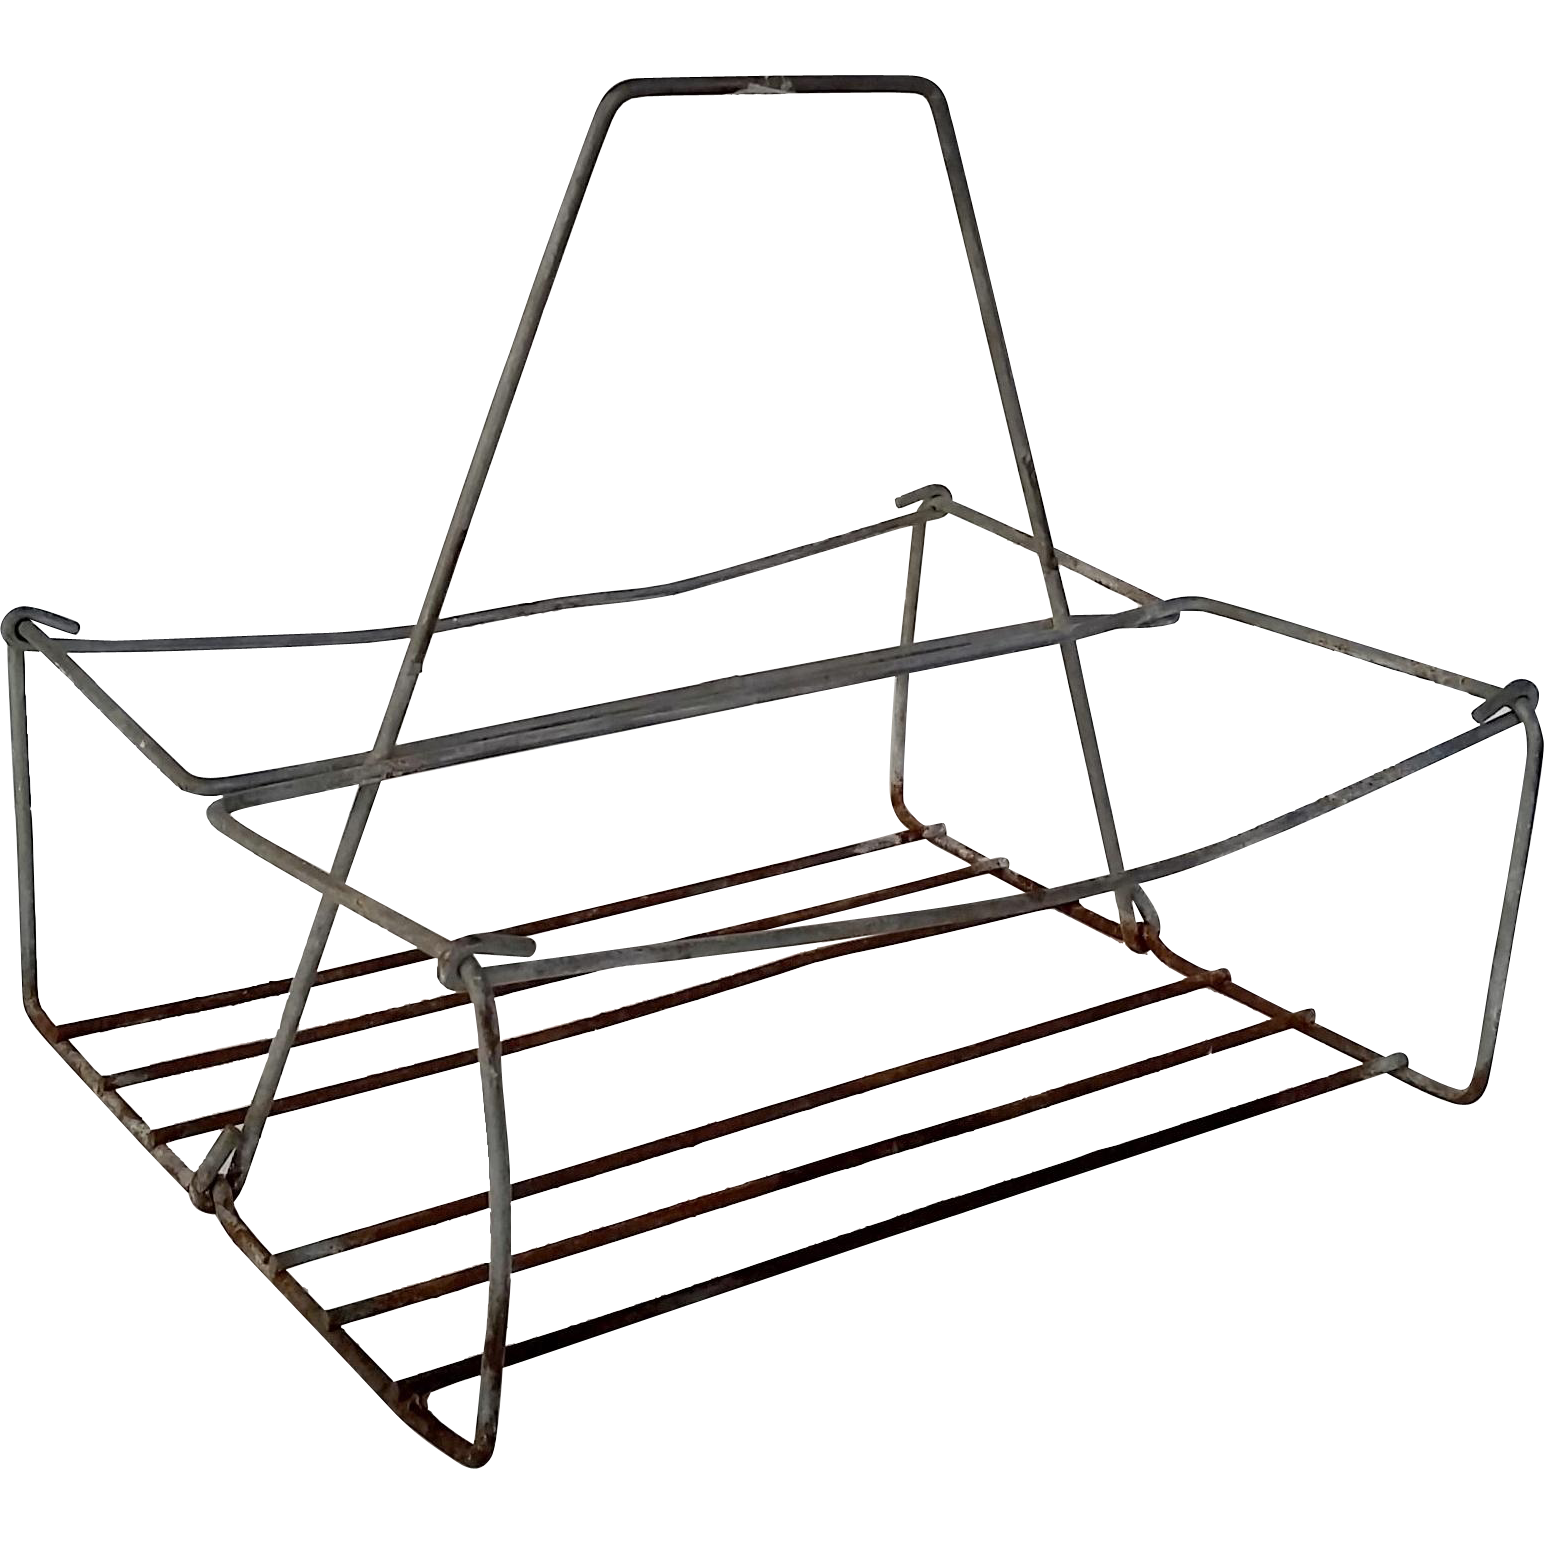 Vintage Metal Wire Caddy Bottle Carrier | Vintage metal, Bottle and ...